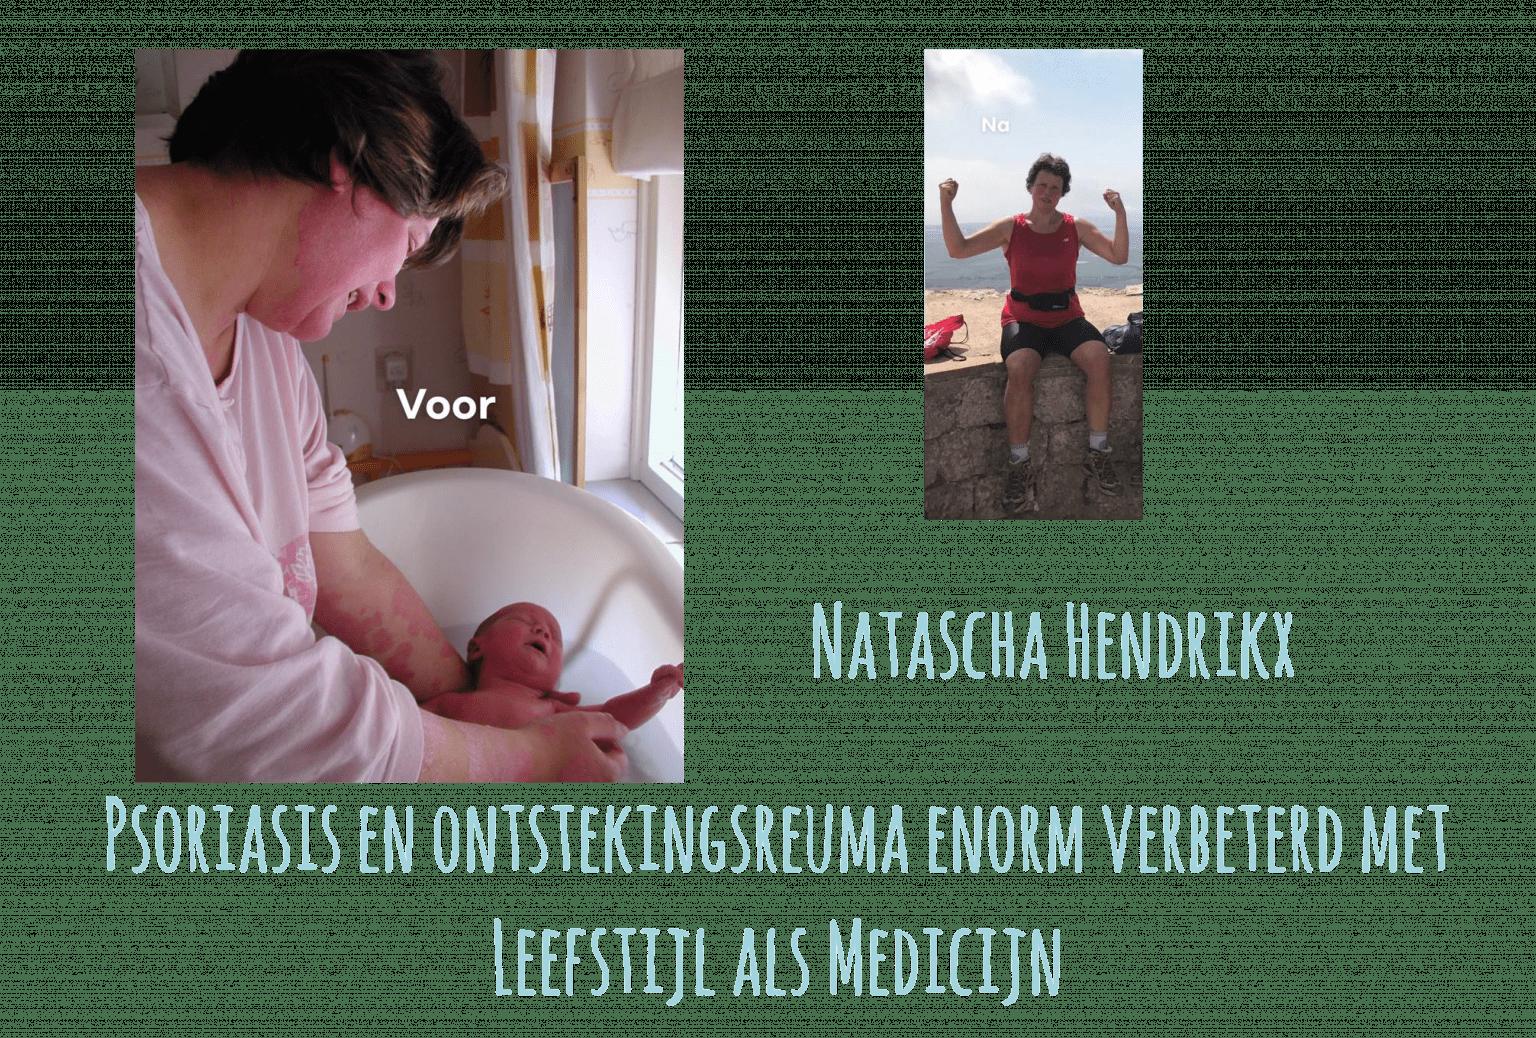 Natascha Hendrikx Psioriasis en Ontstekingsreuma